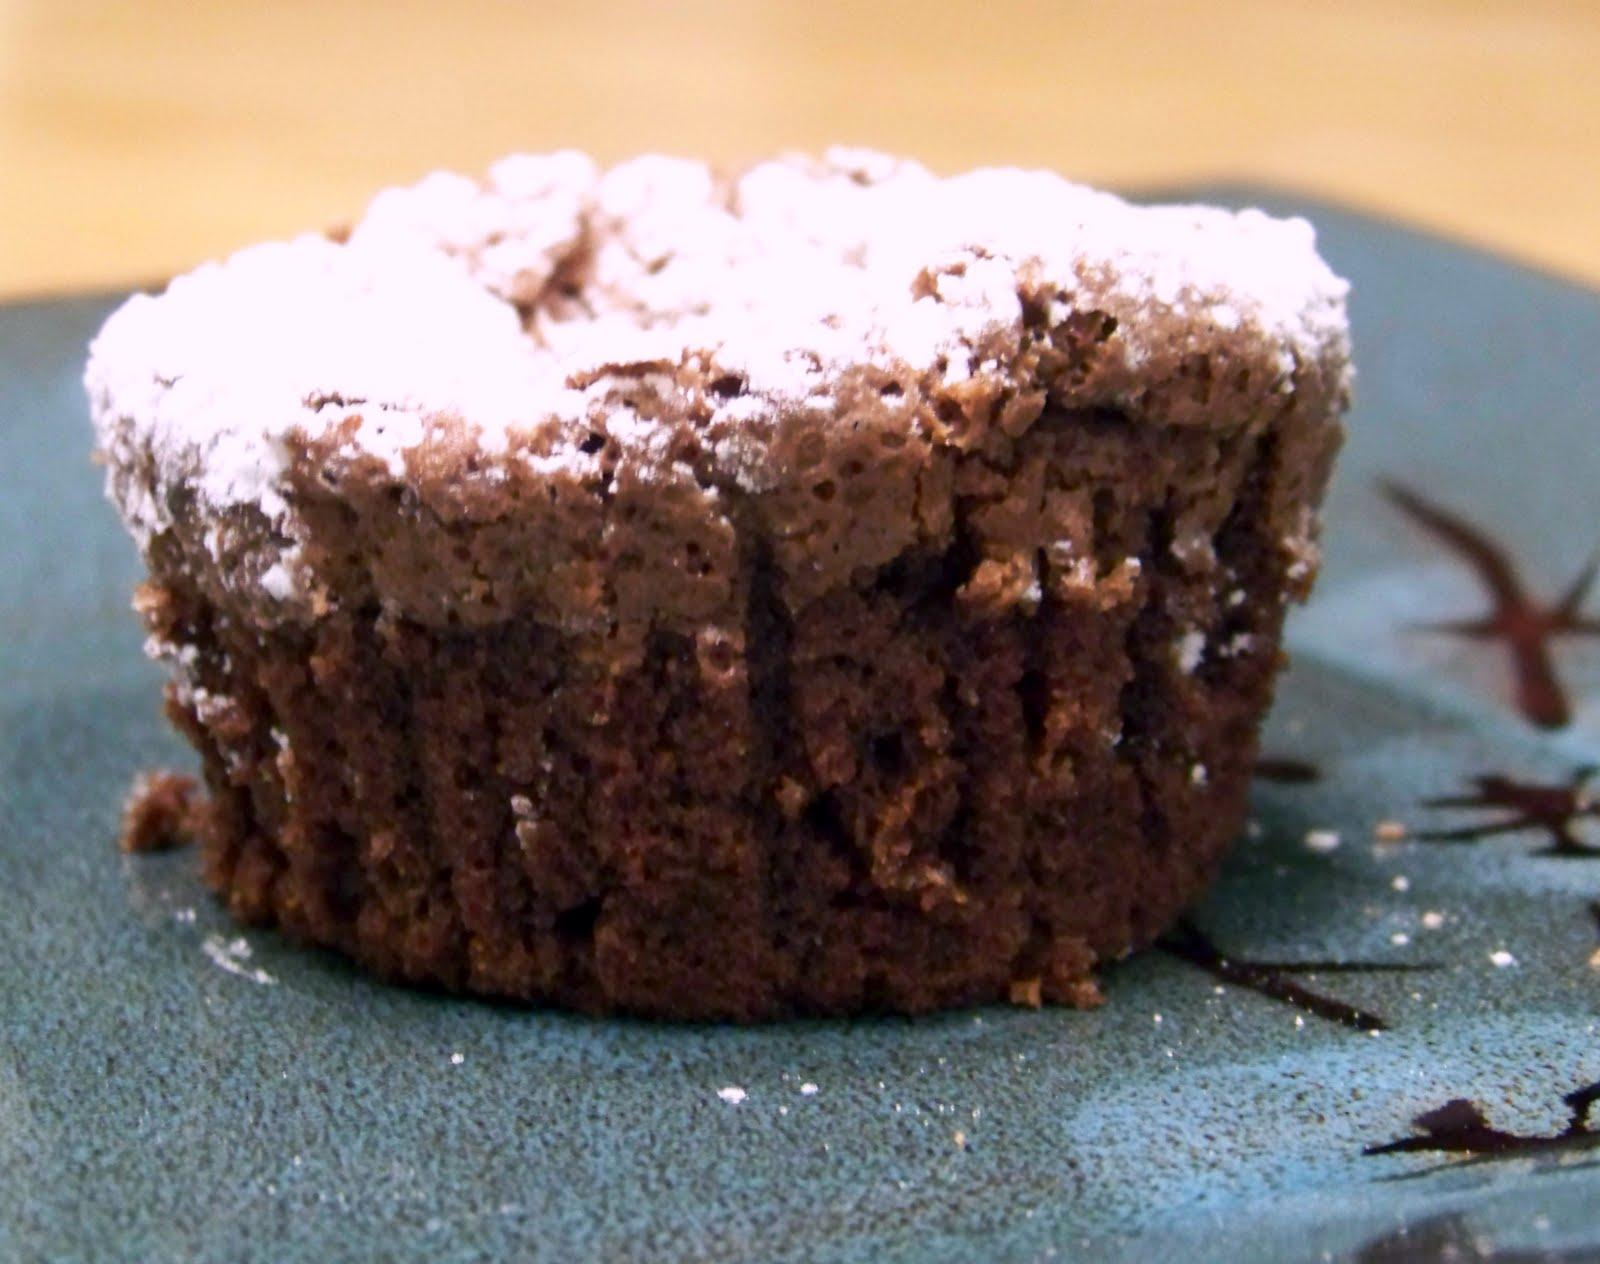 Whimsically Homemade: Flourless Chocolate Cupcakes